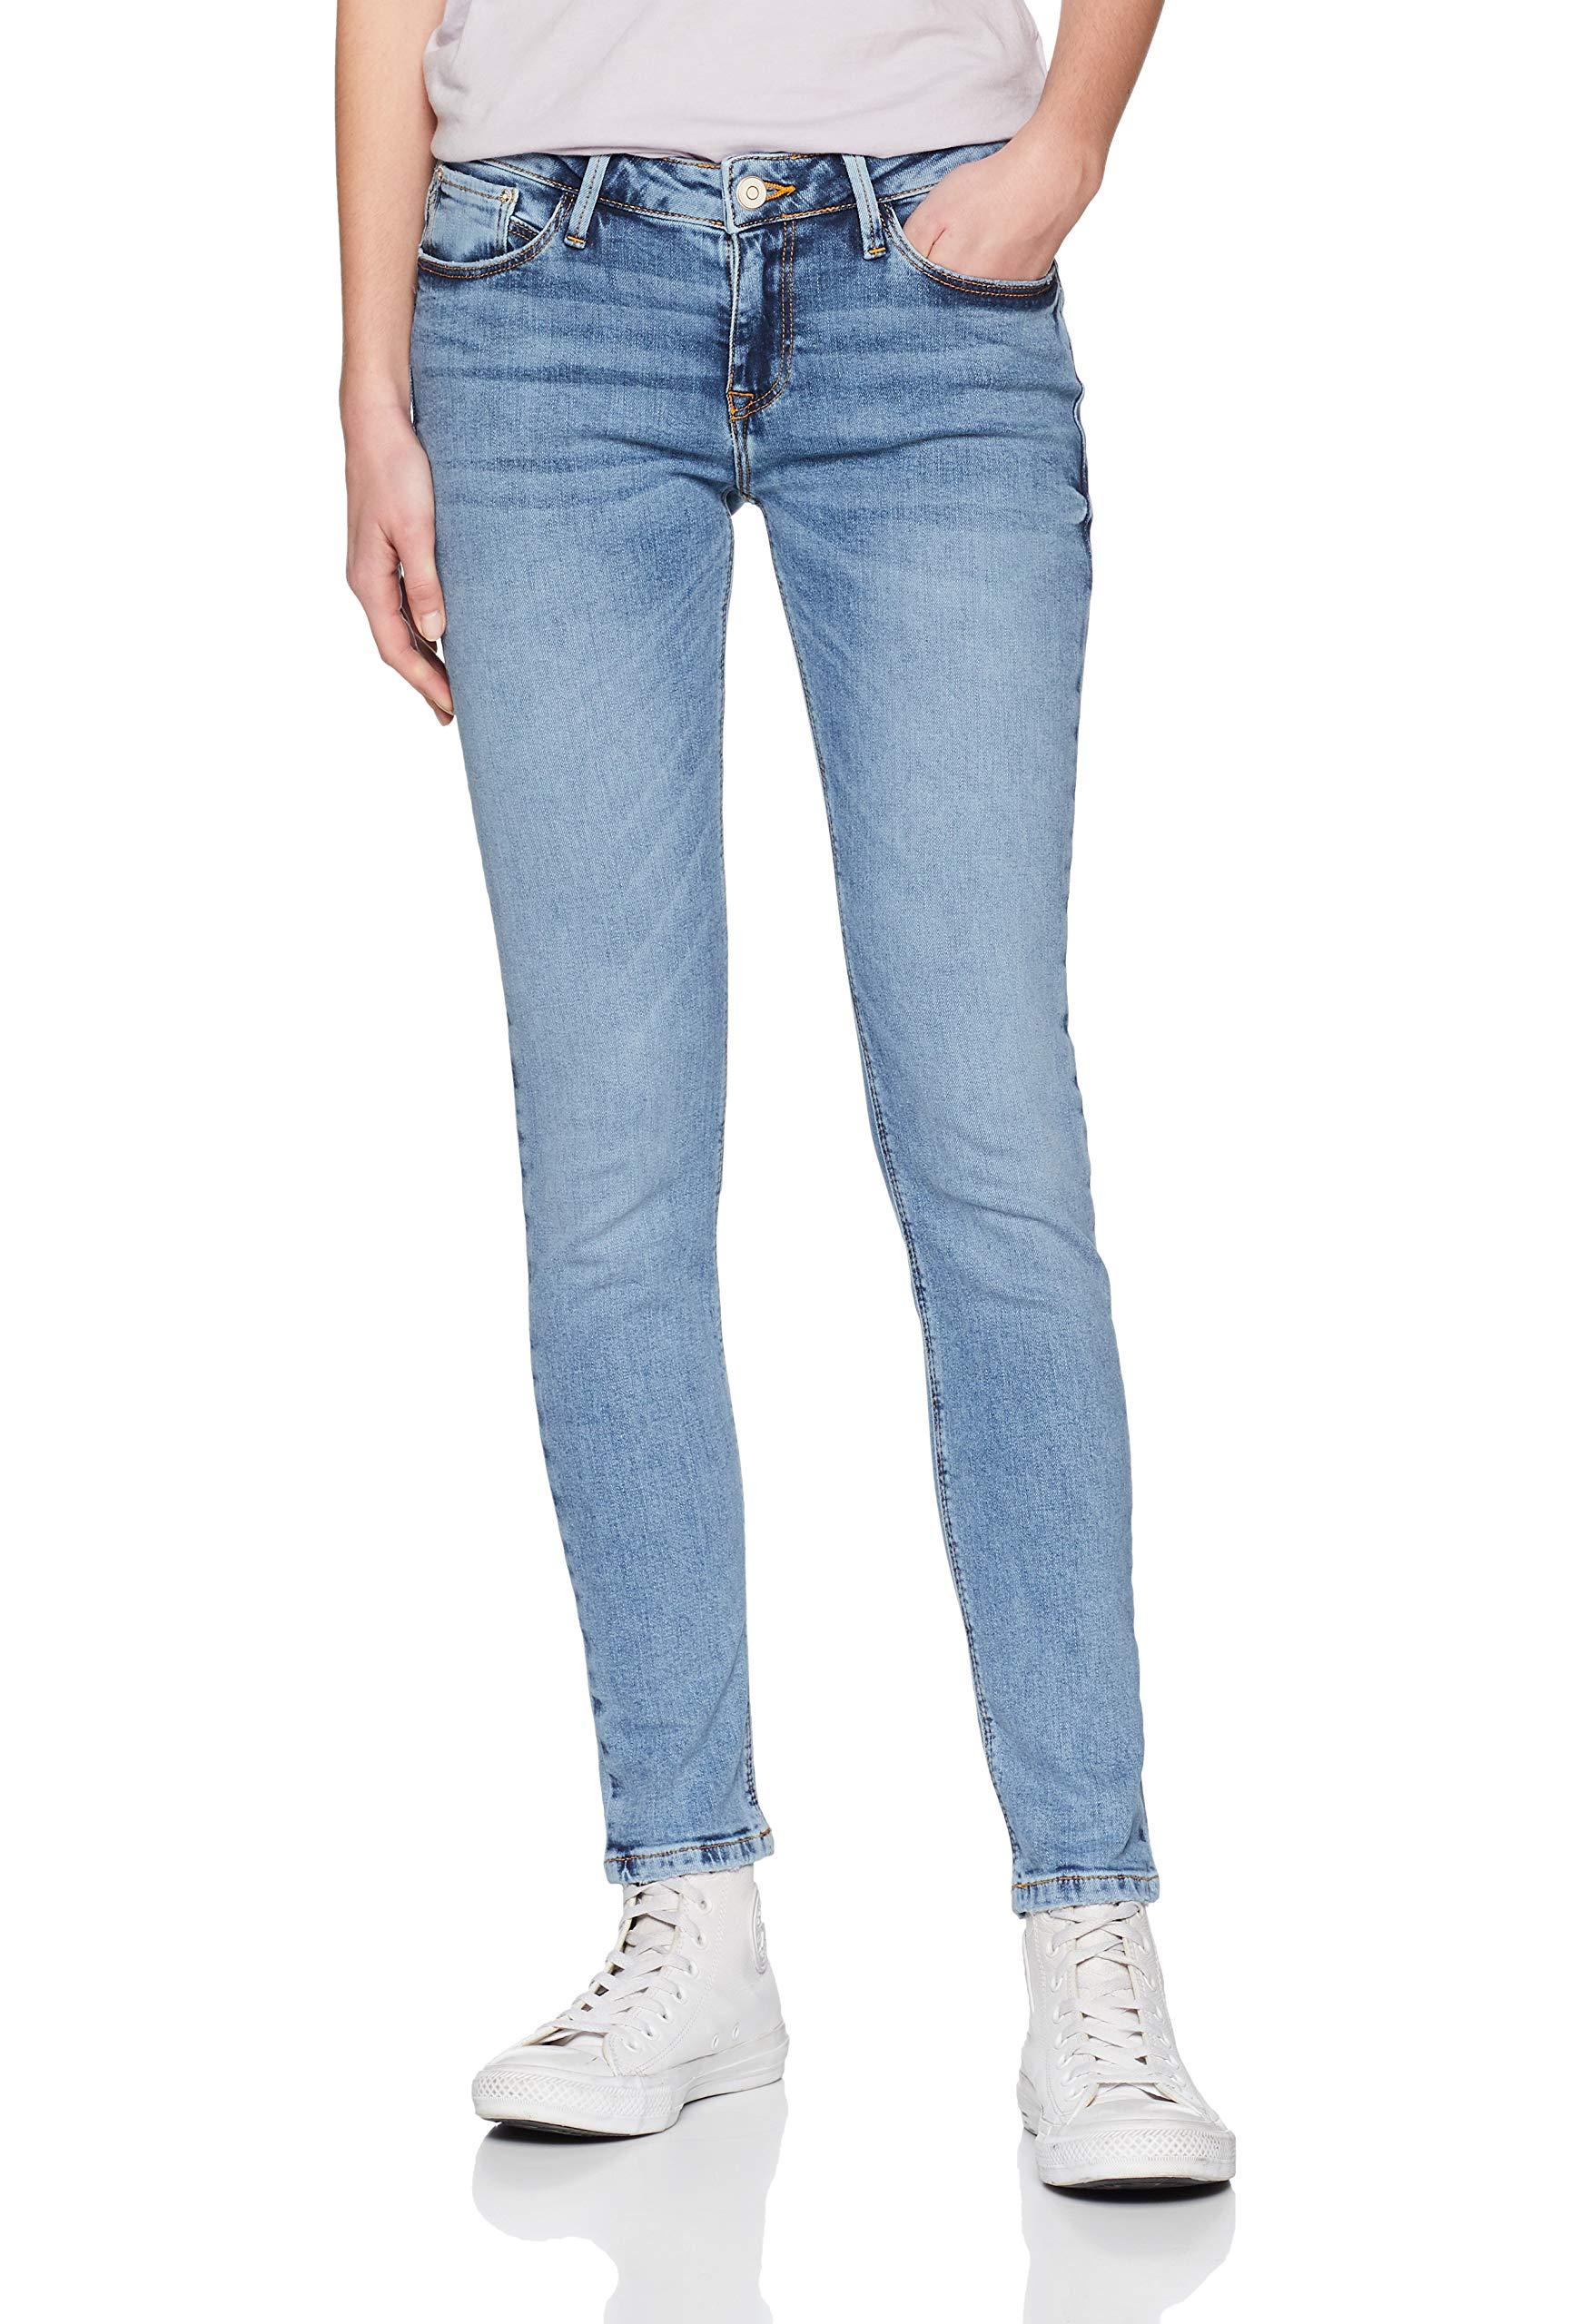 l30taille Cross Jeans Jean 30Femme SkinnyBleulight 208W29 Fabricant29 Mid Adriana Blue 6yYbf7gv